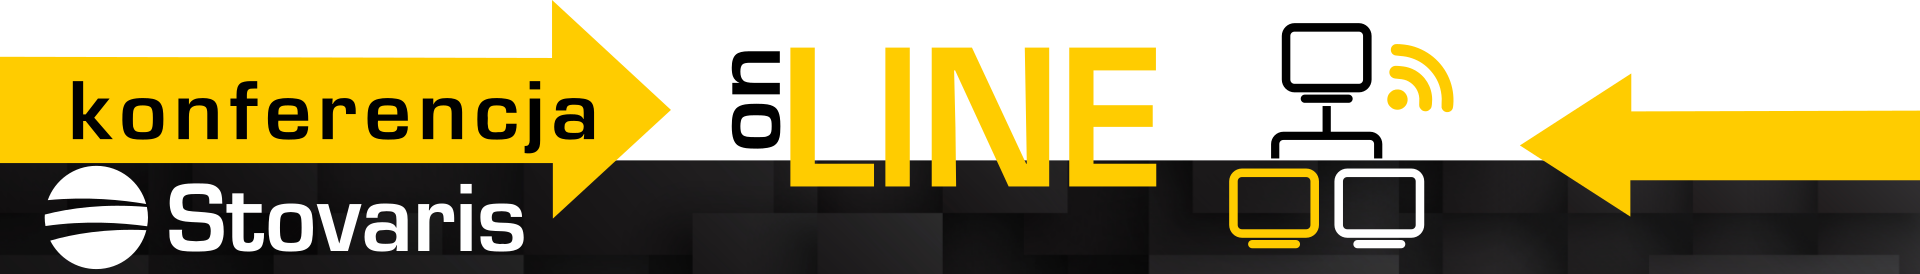 Siec IT bez tajemnic - konferencja online 15.04.2021 FOOTER POL